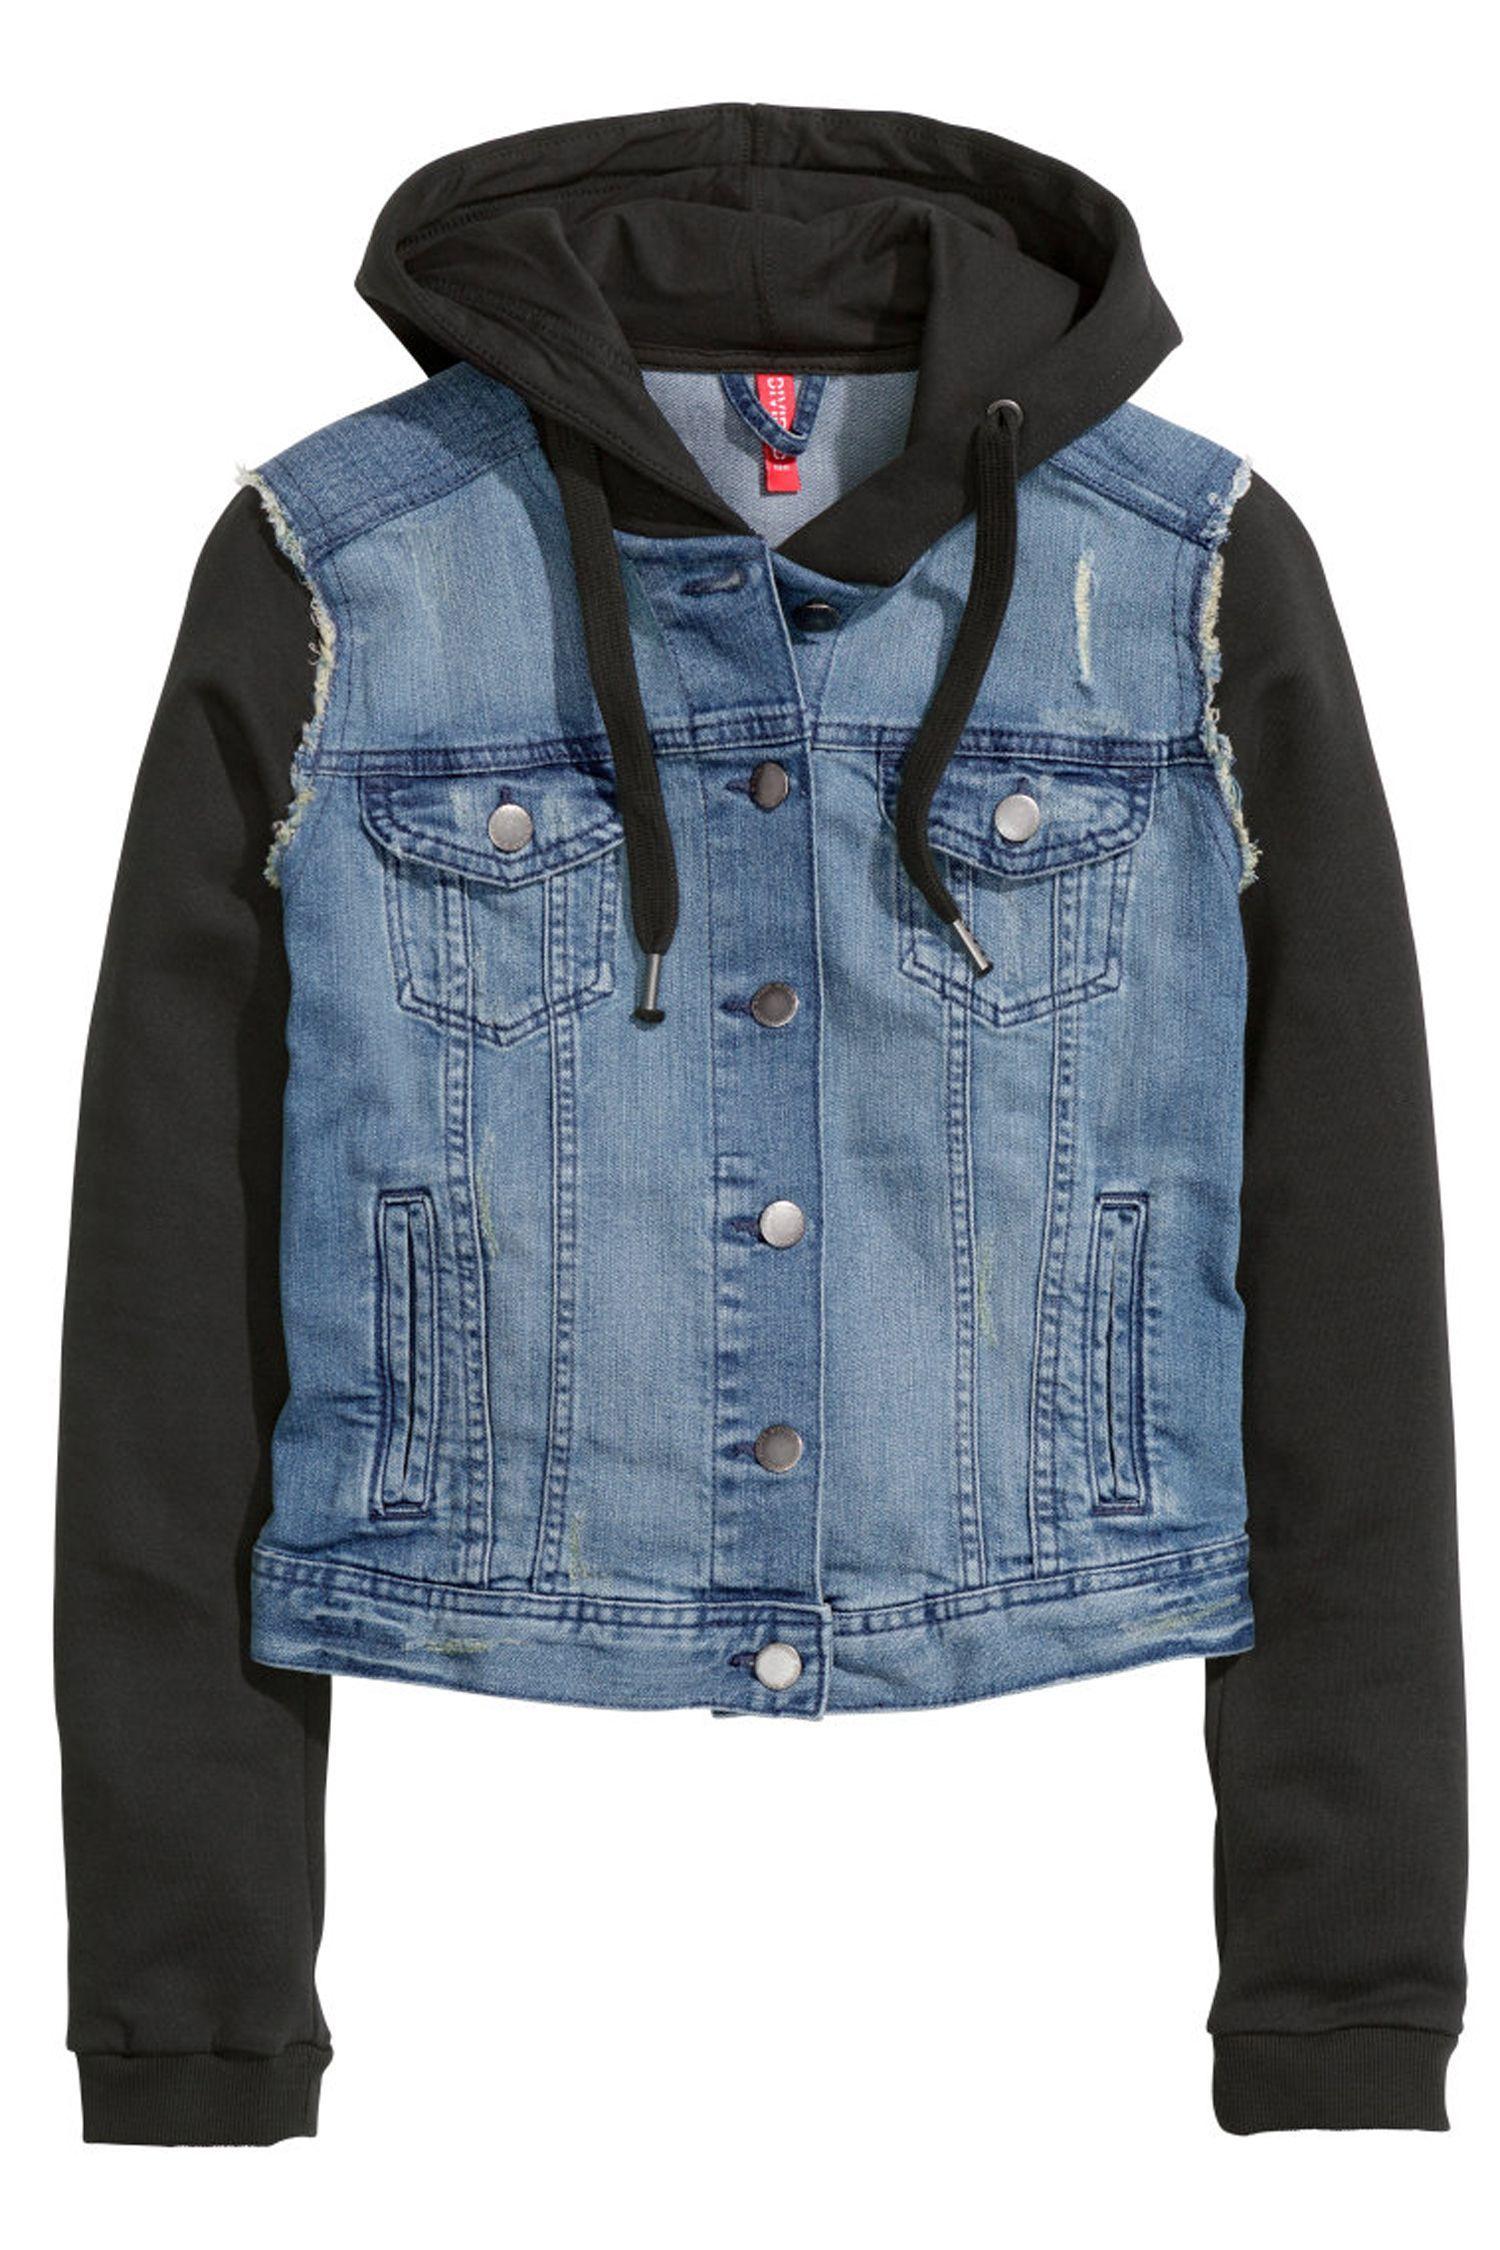 25 Seriously Cute Game Day Essentials H M Denim Jacket Denim Jacket Hooded Denim Jacket [ 2250 x 1500 Pixel ]